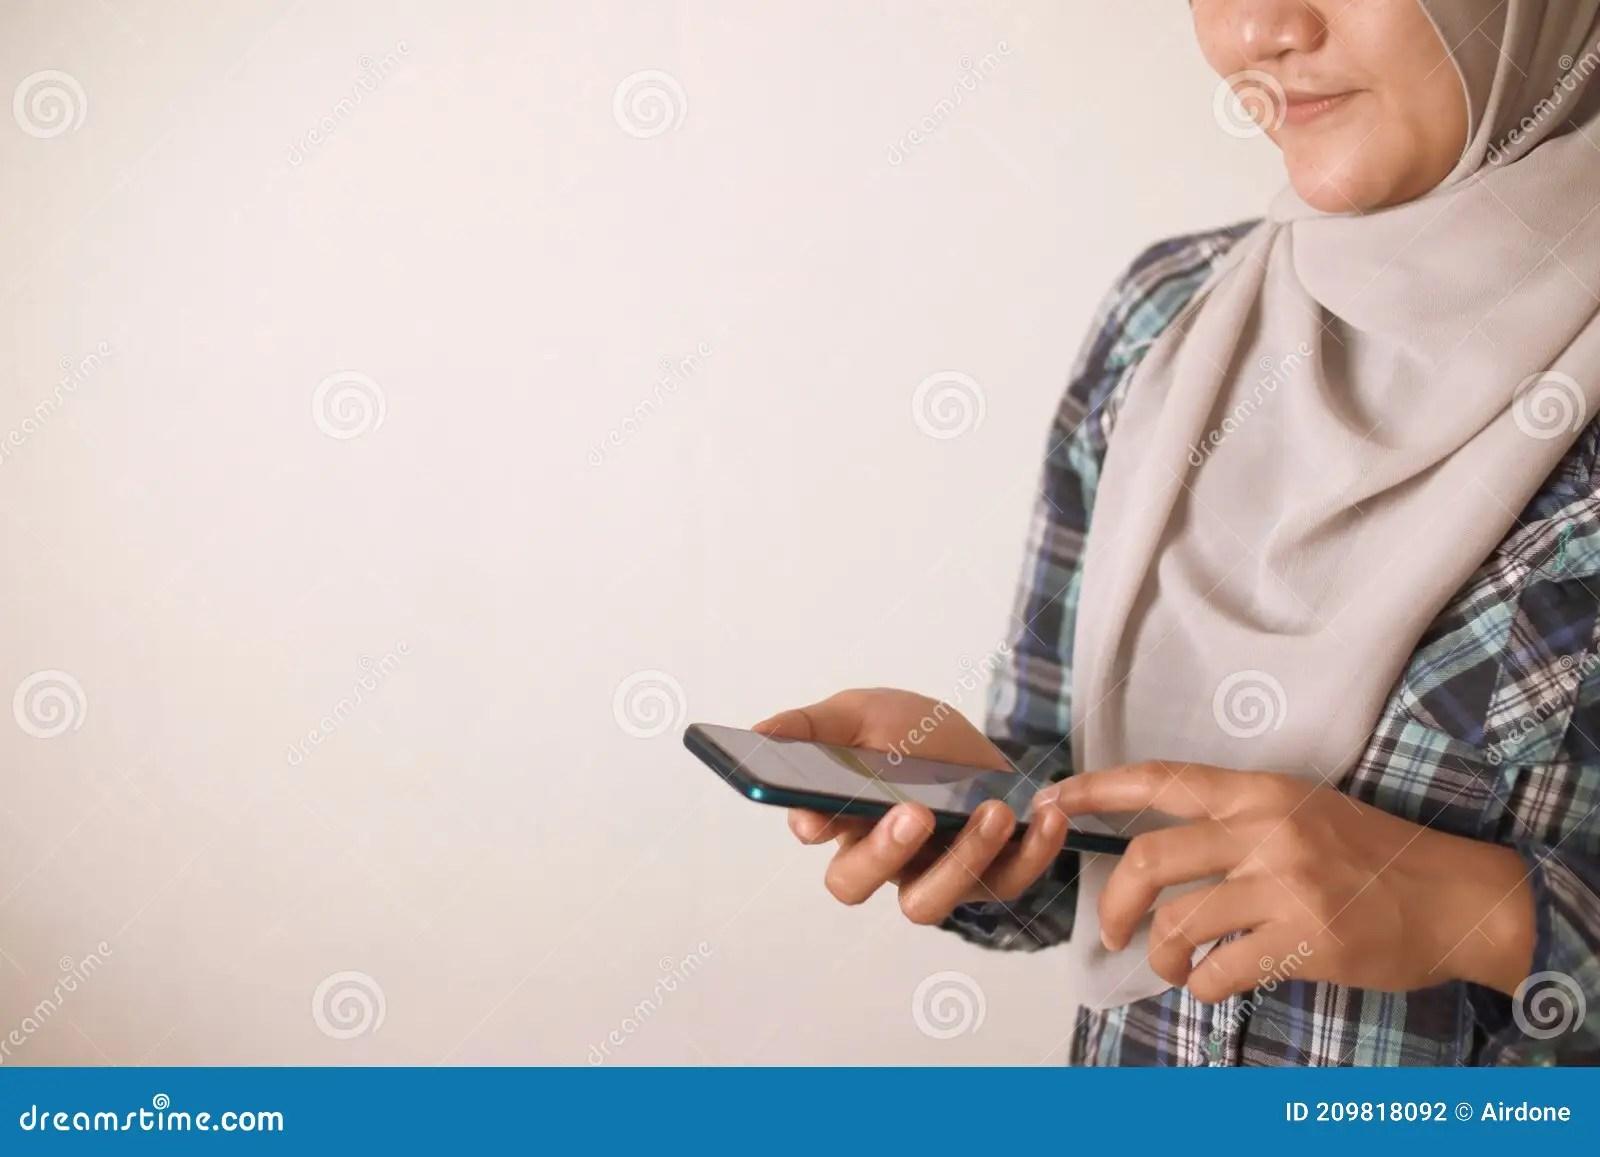 Mädchen ragazza asia asa fick. 257 455 Internet Gadget Photos Free Royalty Free Stock Photos From Dreamstime